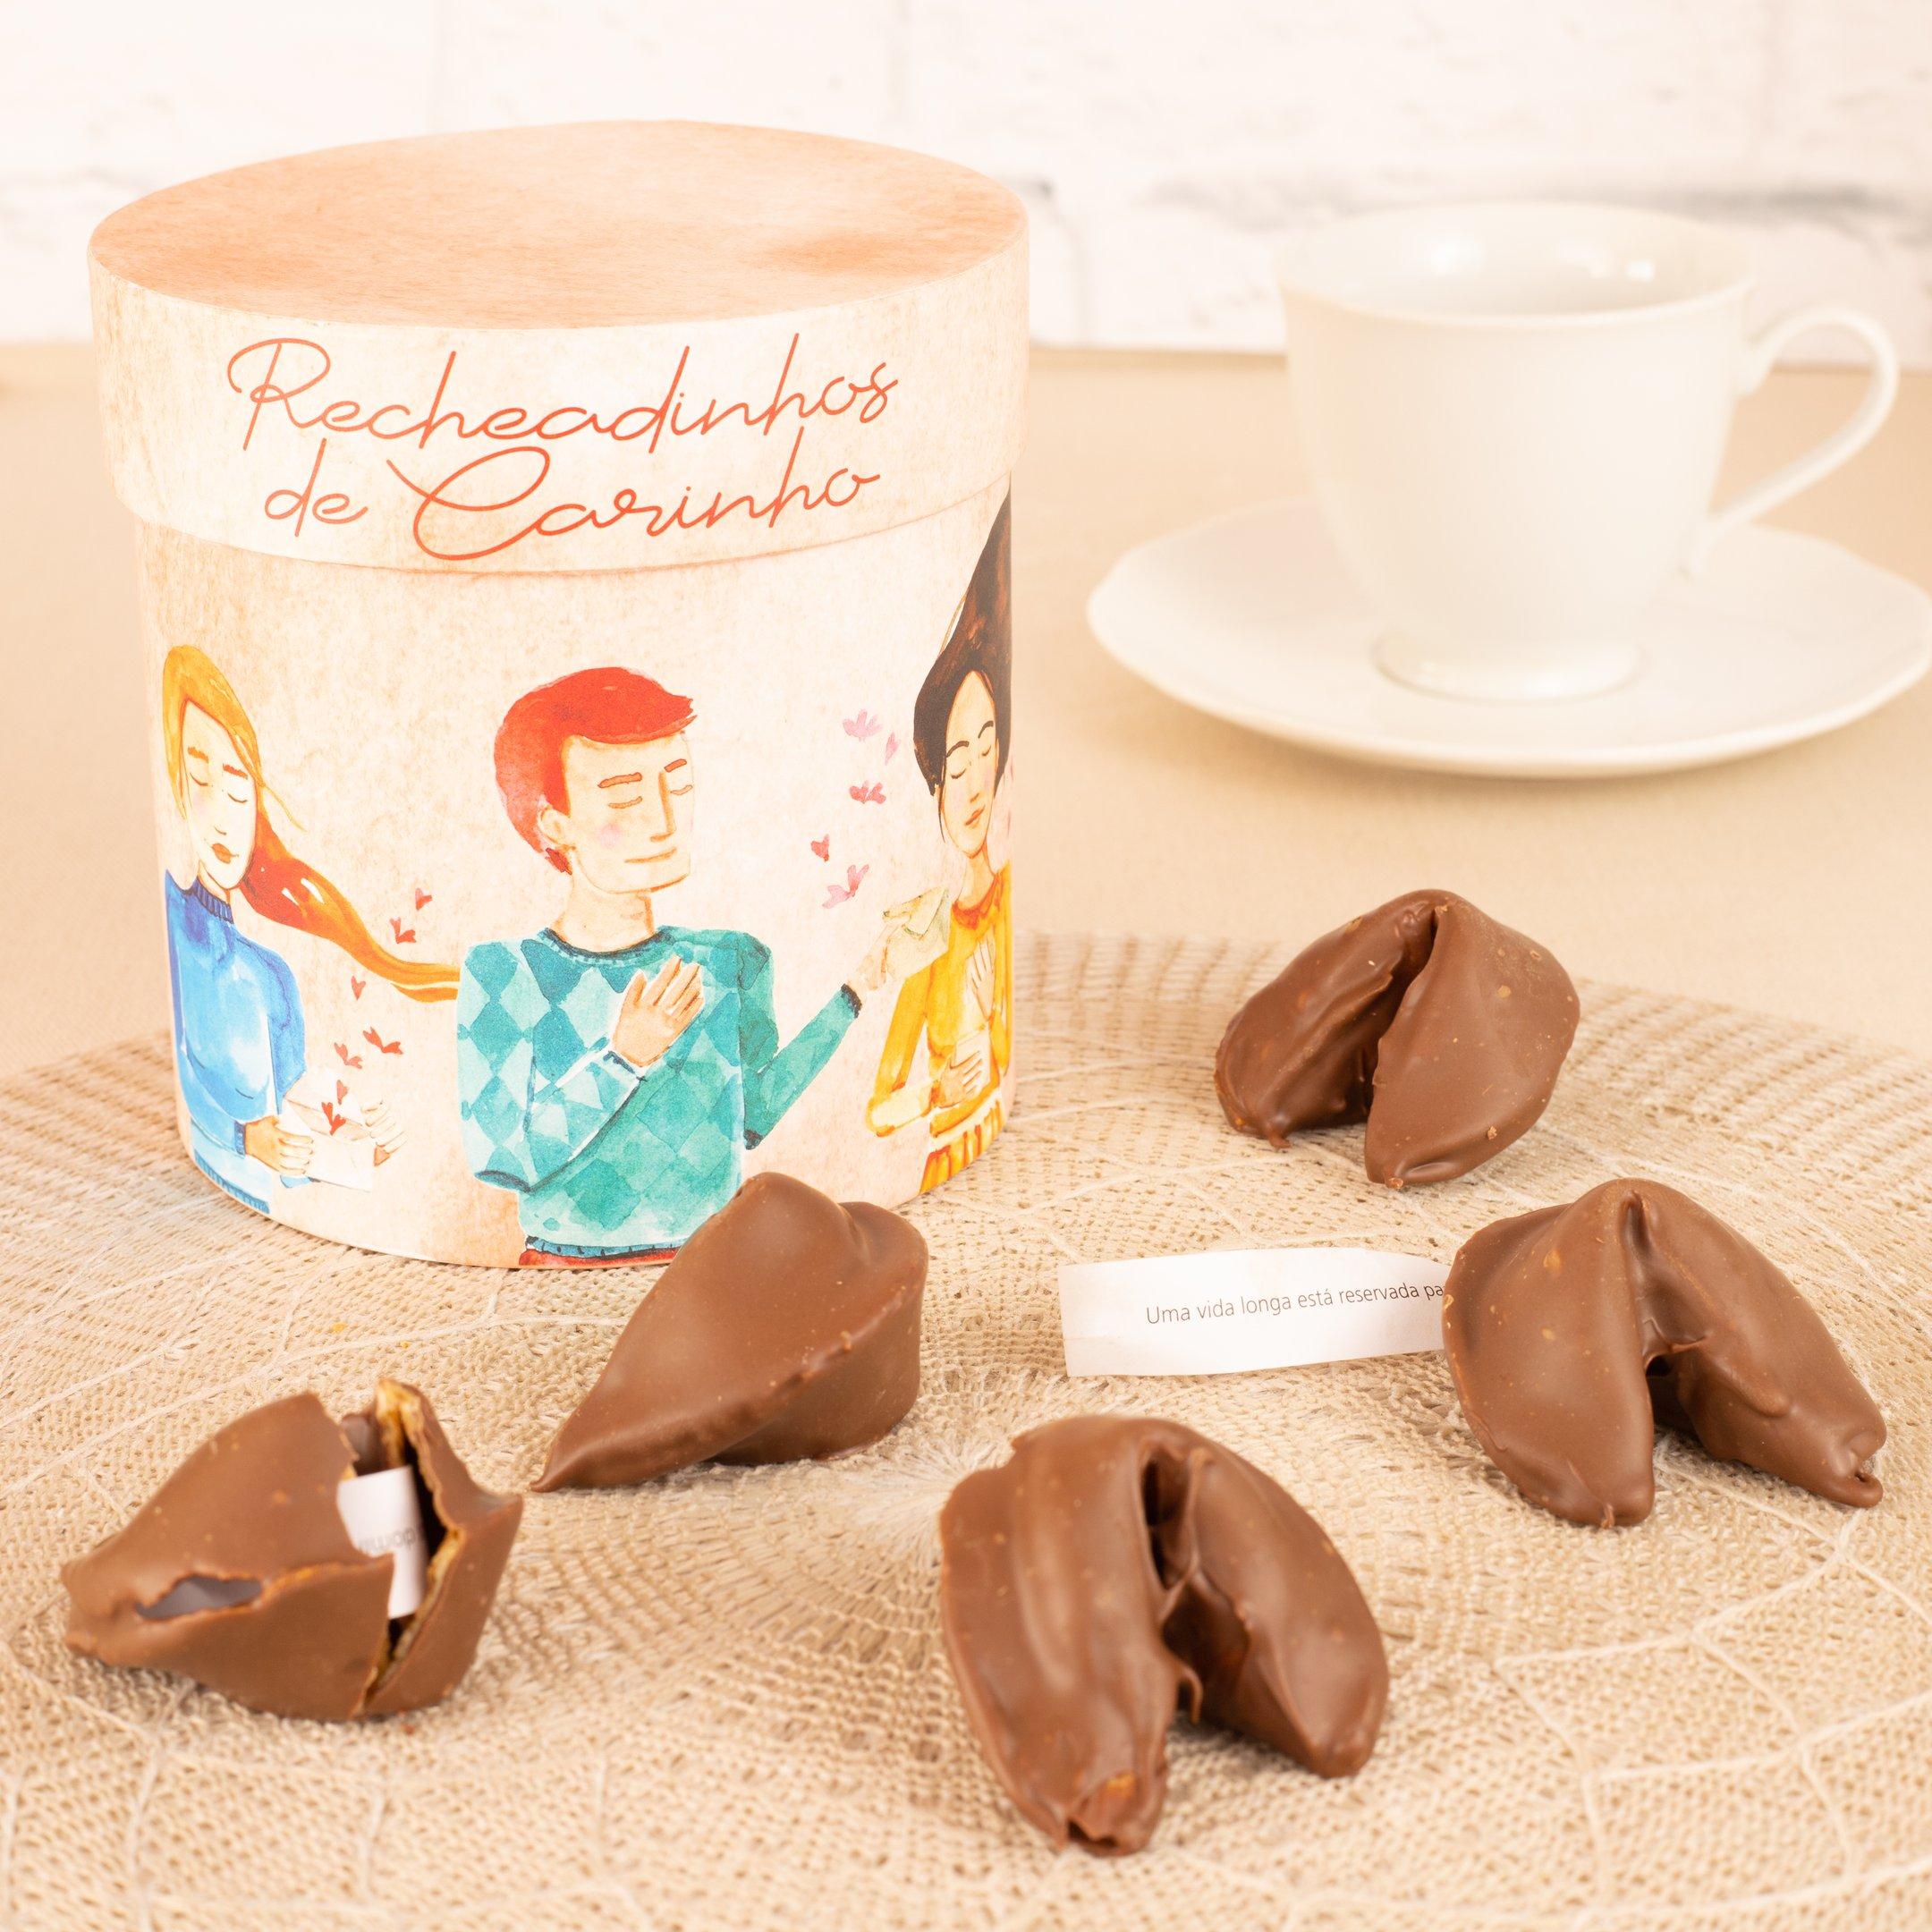 Lata Biscoito Da Sorte Recheado de Carinho